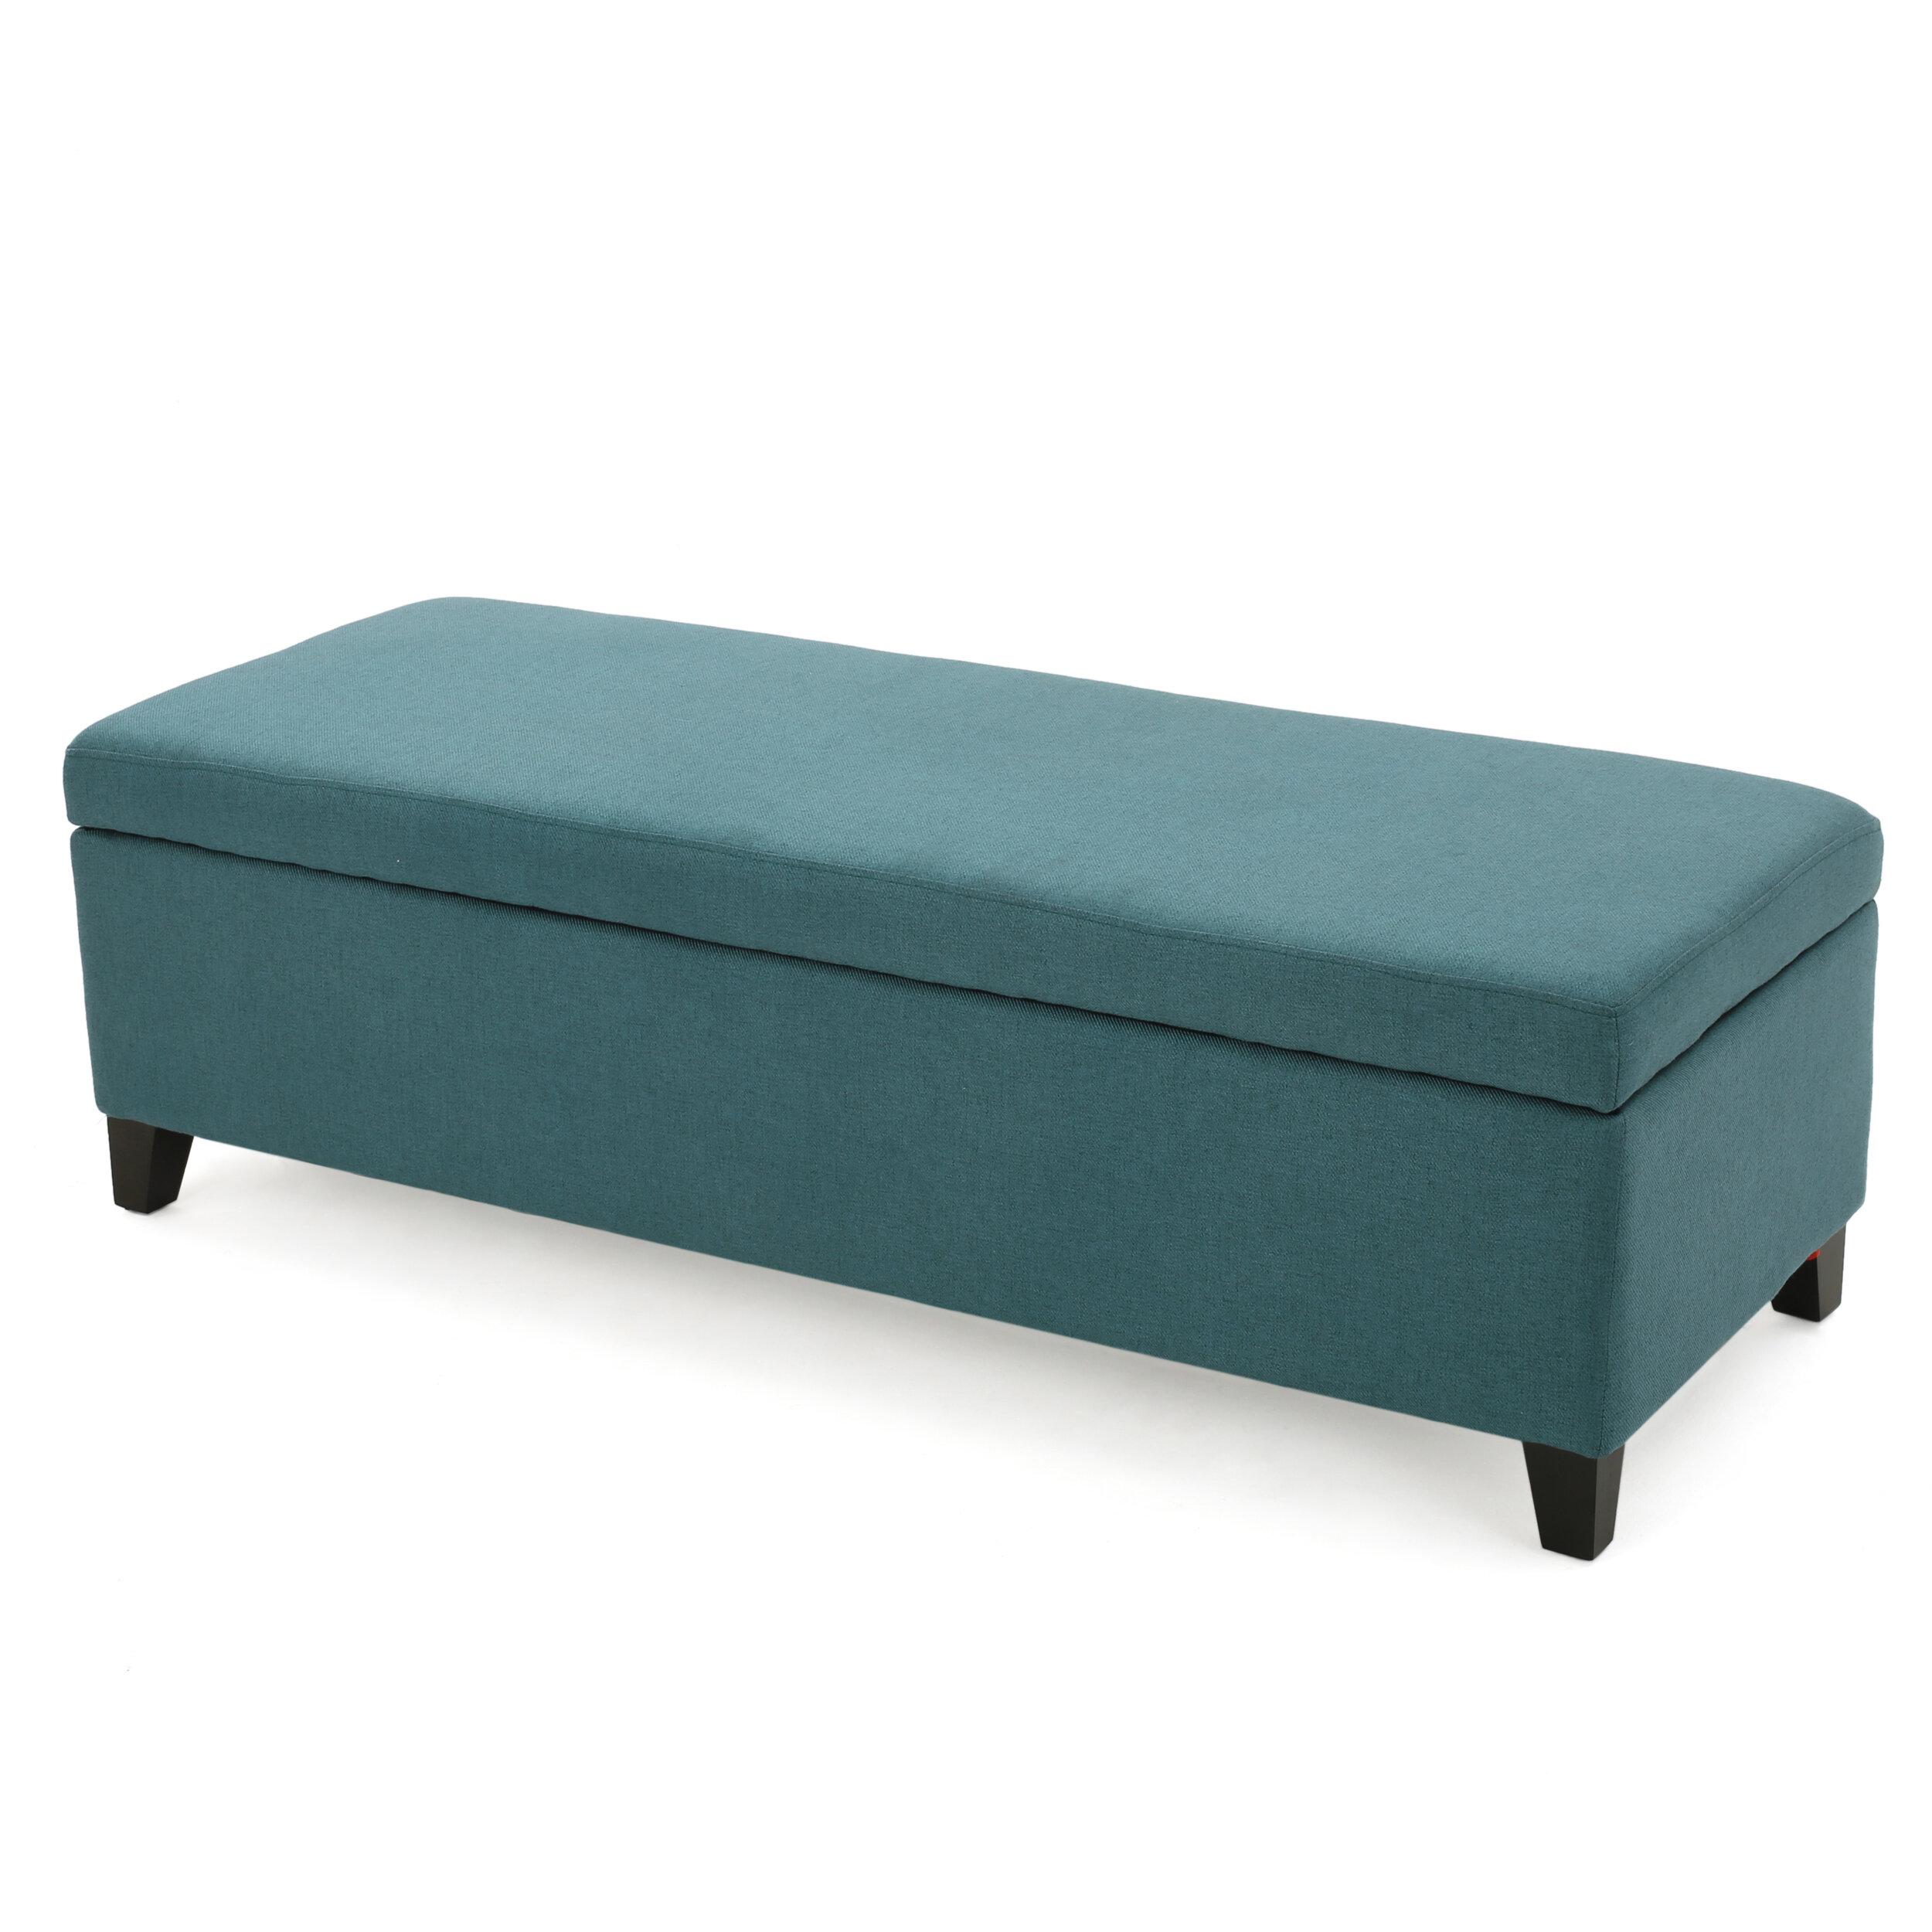 Zipcode Design Ewan Upholstered Storage Bench & Reviews | Wayfair